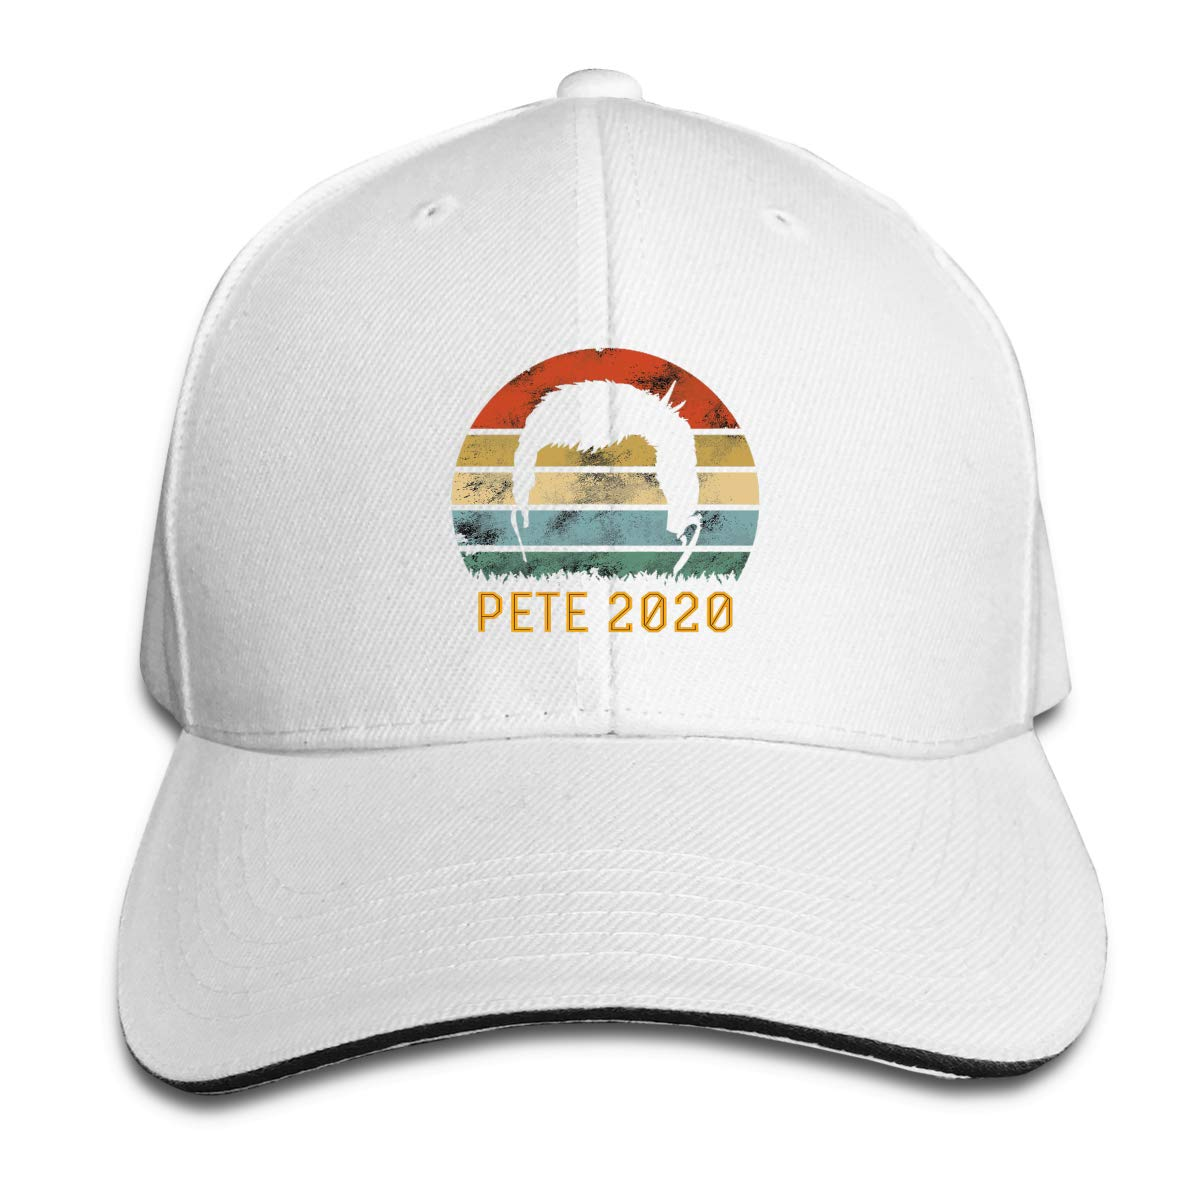 Mayor Pete Buttigieg 2020 Adjustable Sports Hats Sun Hat for Men and Women